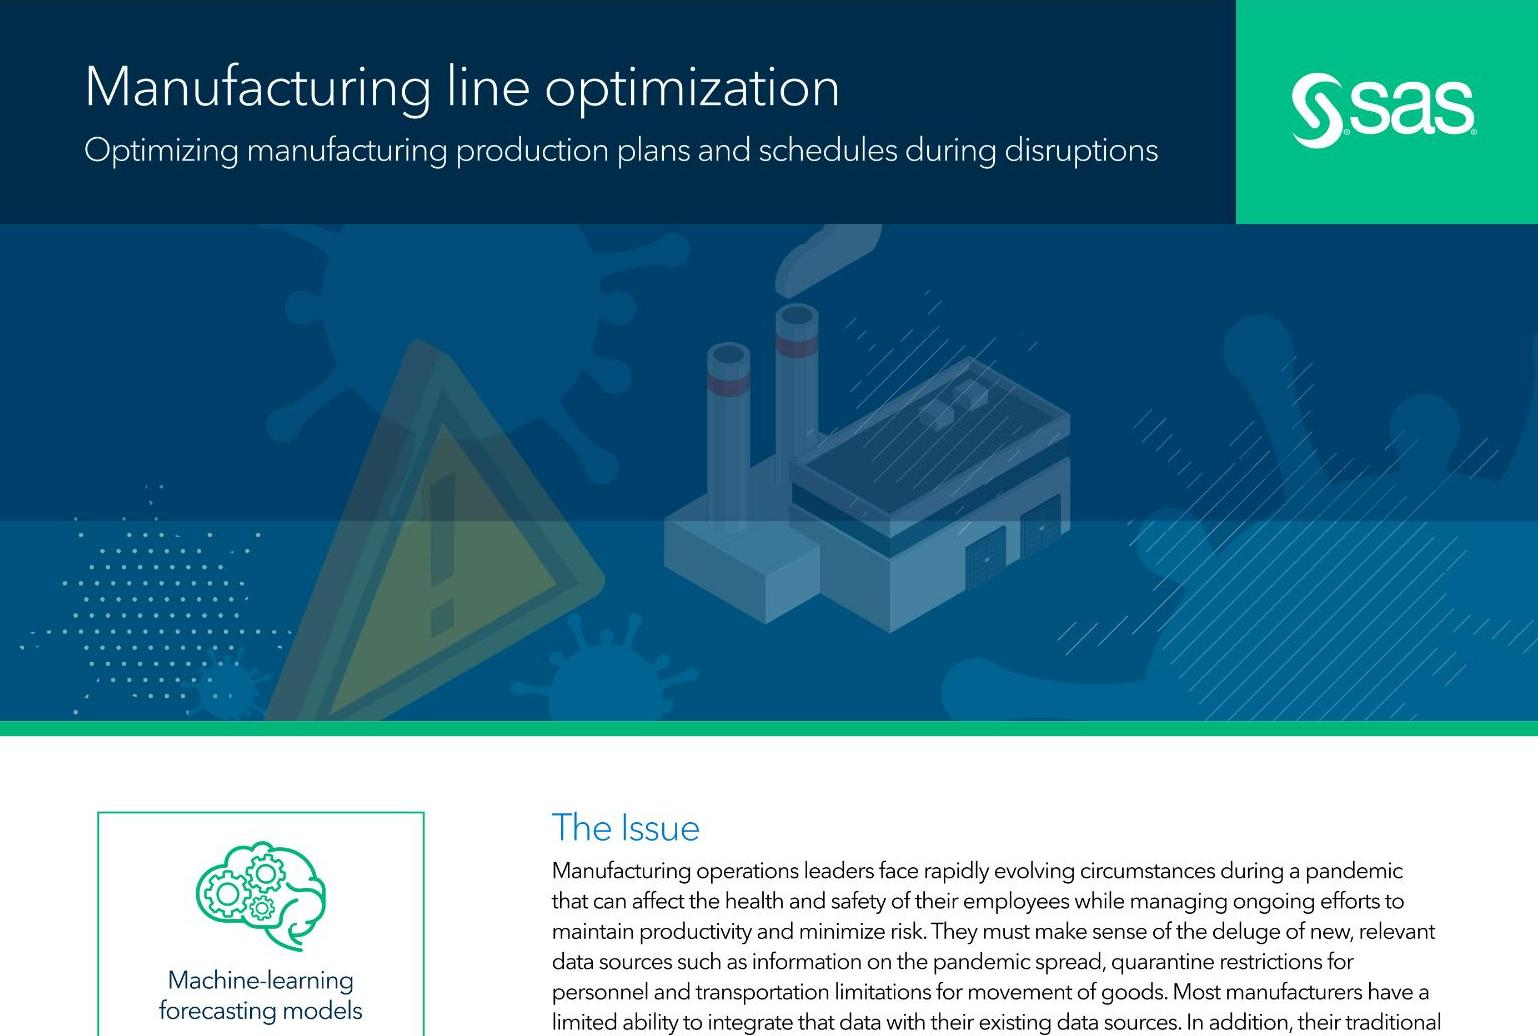 Manufacturing line optimization